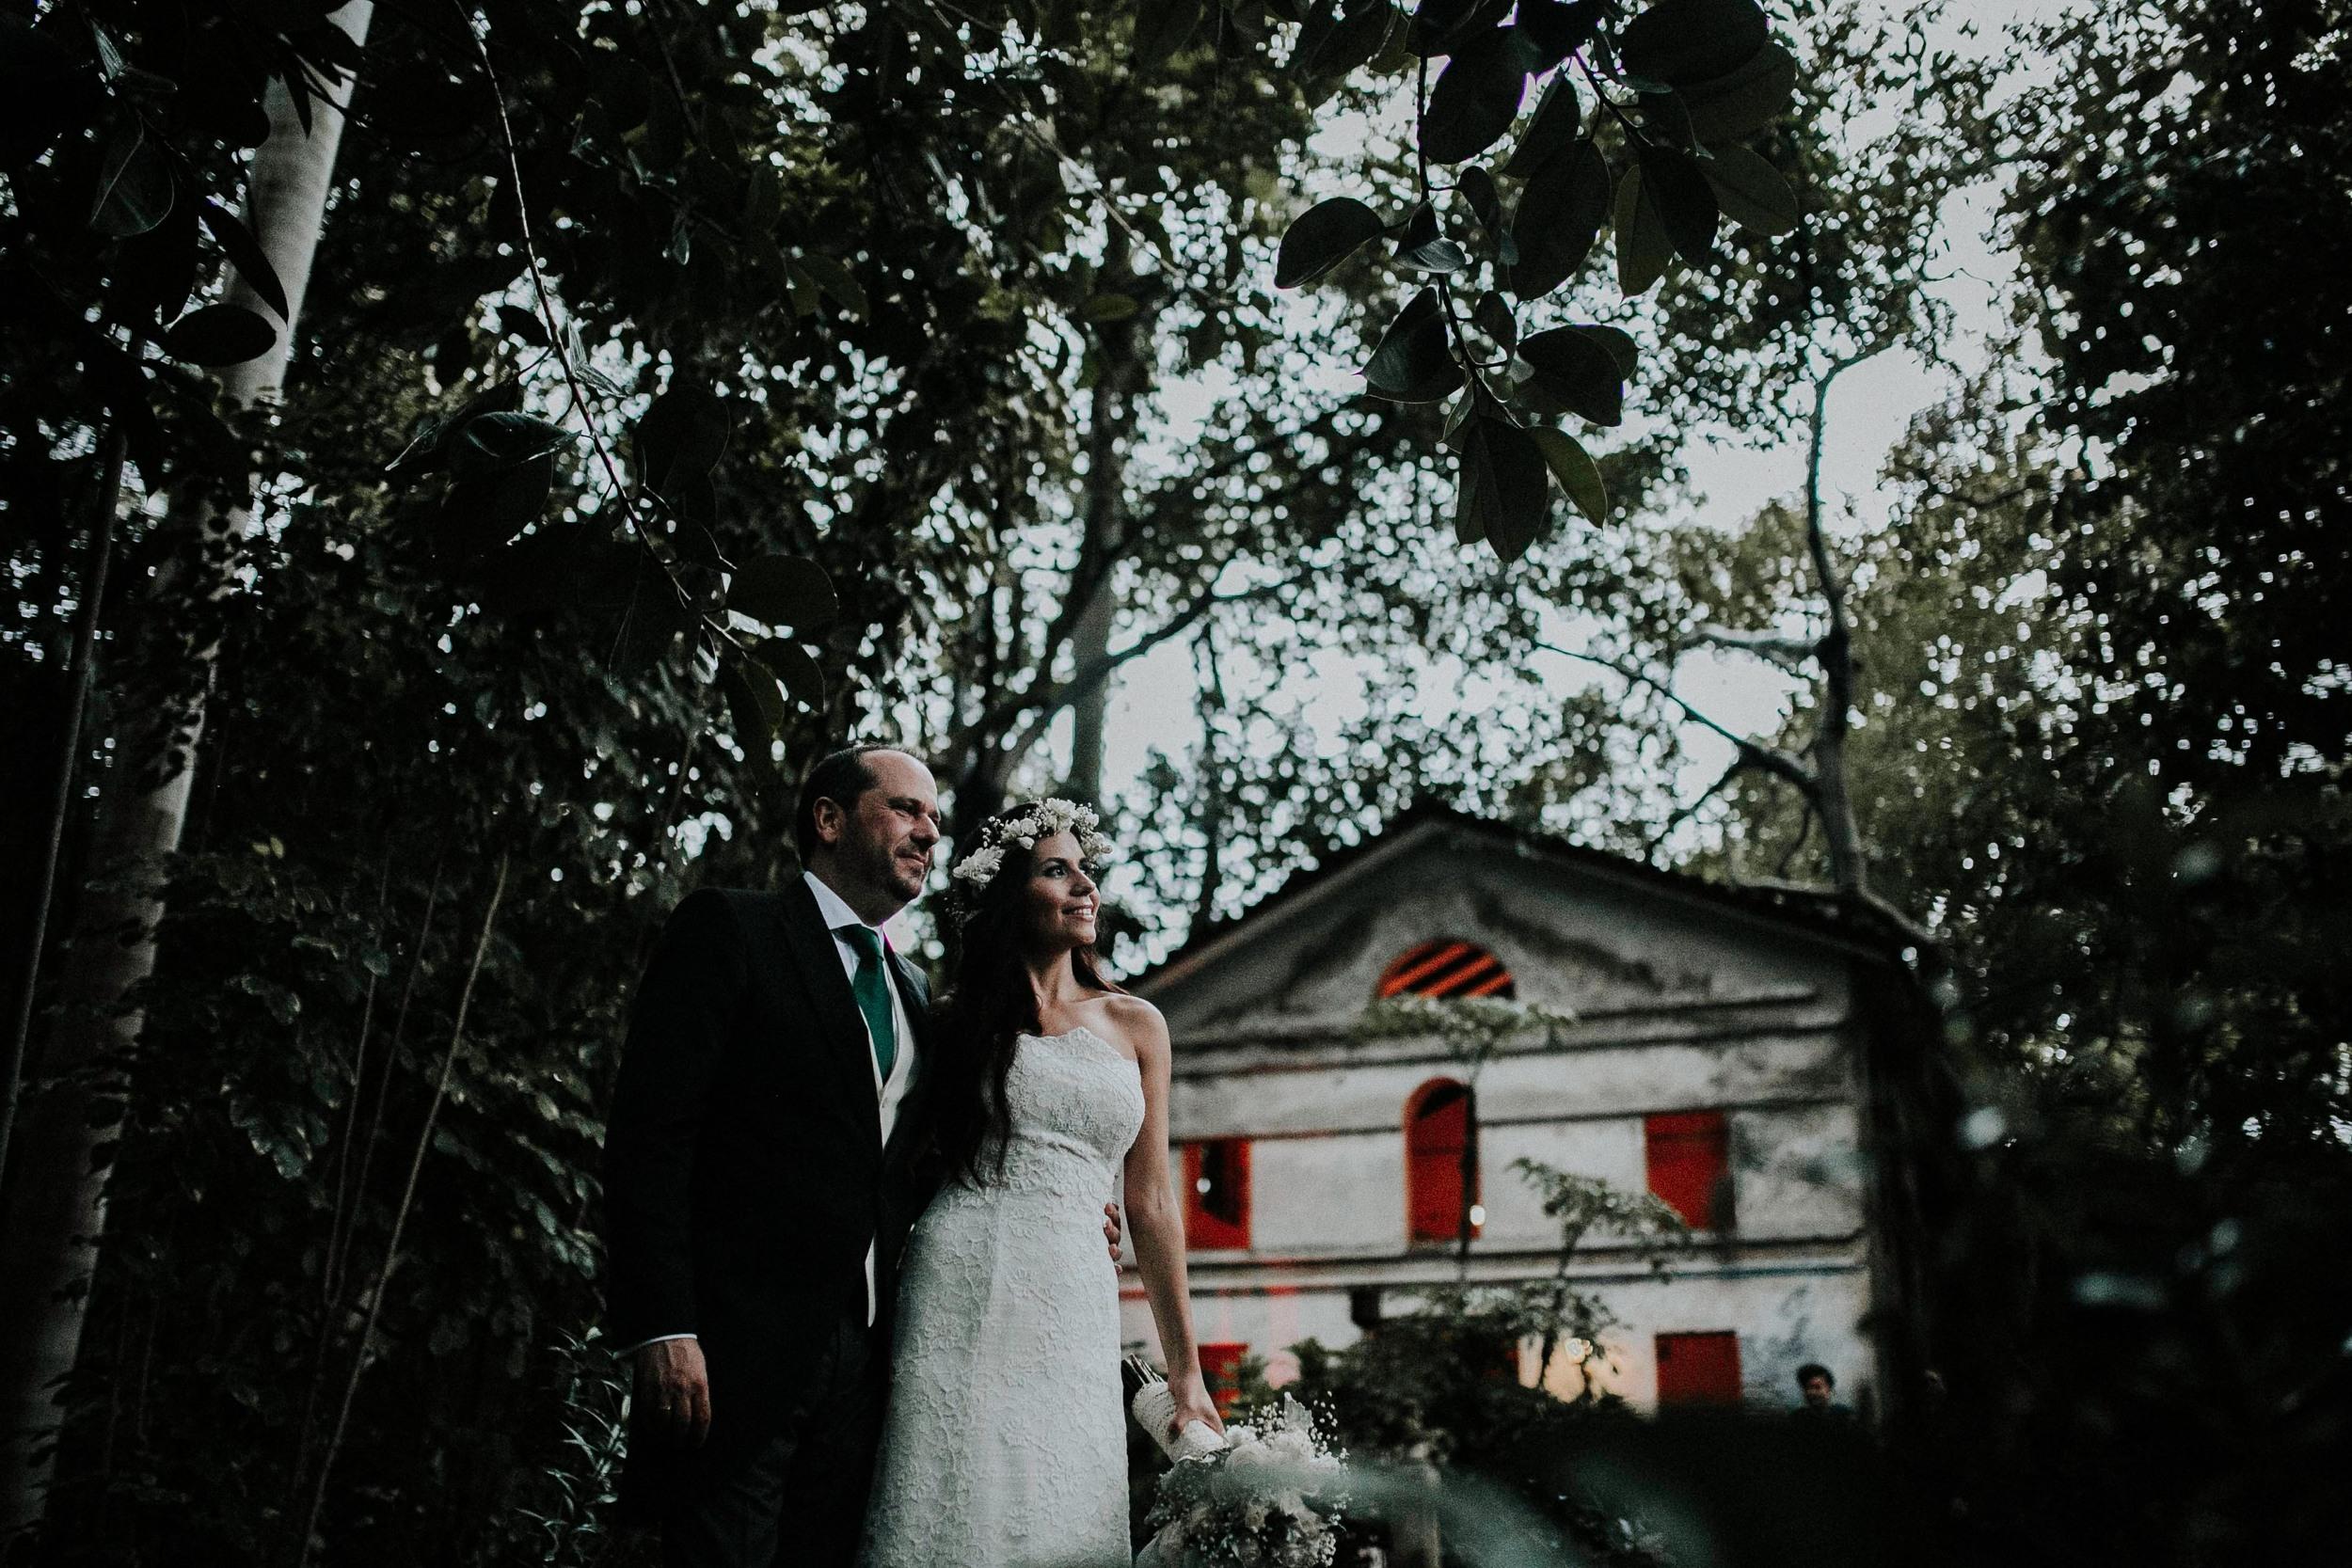 643A2326-Editaralfonso_flores_destination_wedding_photographer_San_gabriel_de_las_palmas.jpg